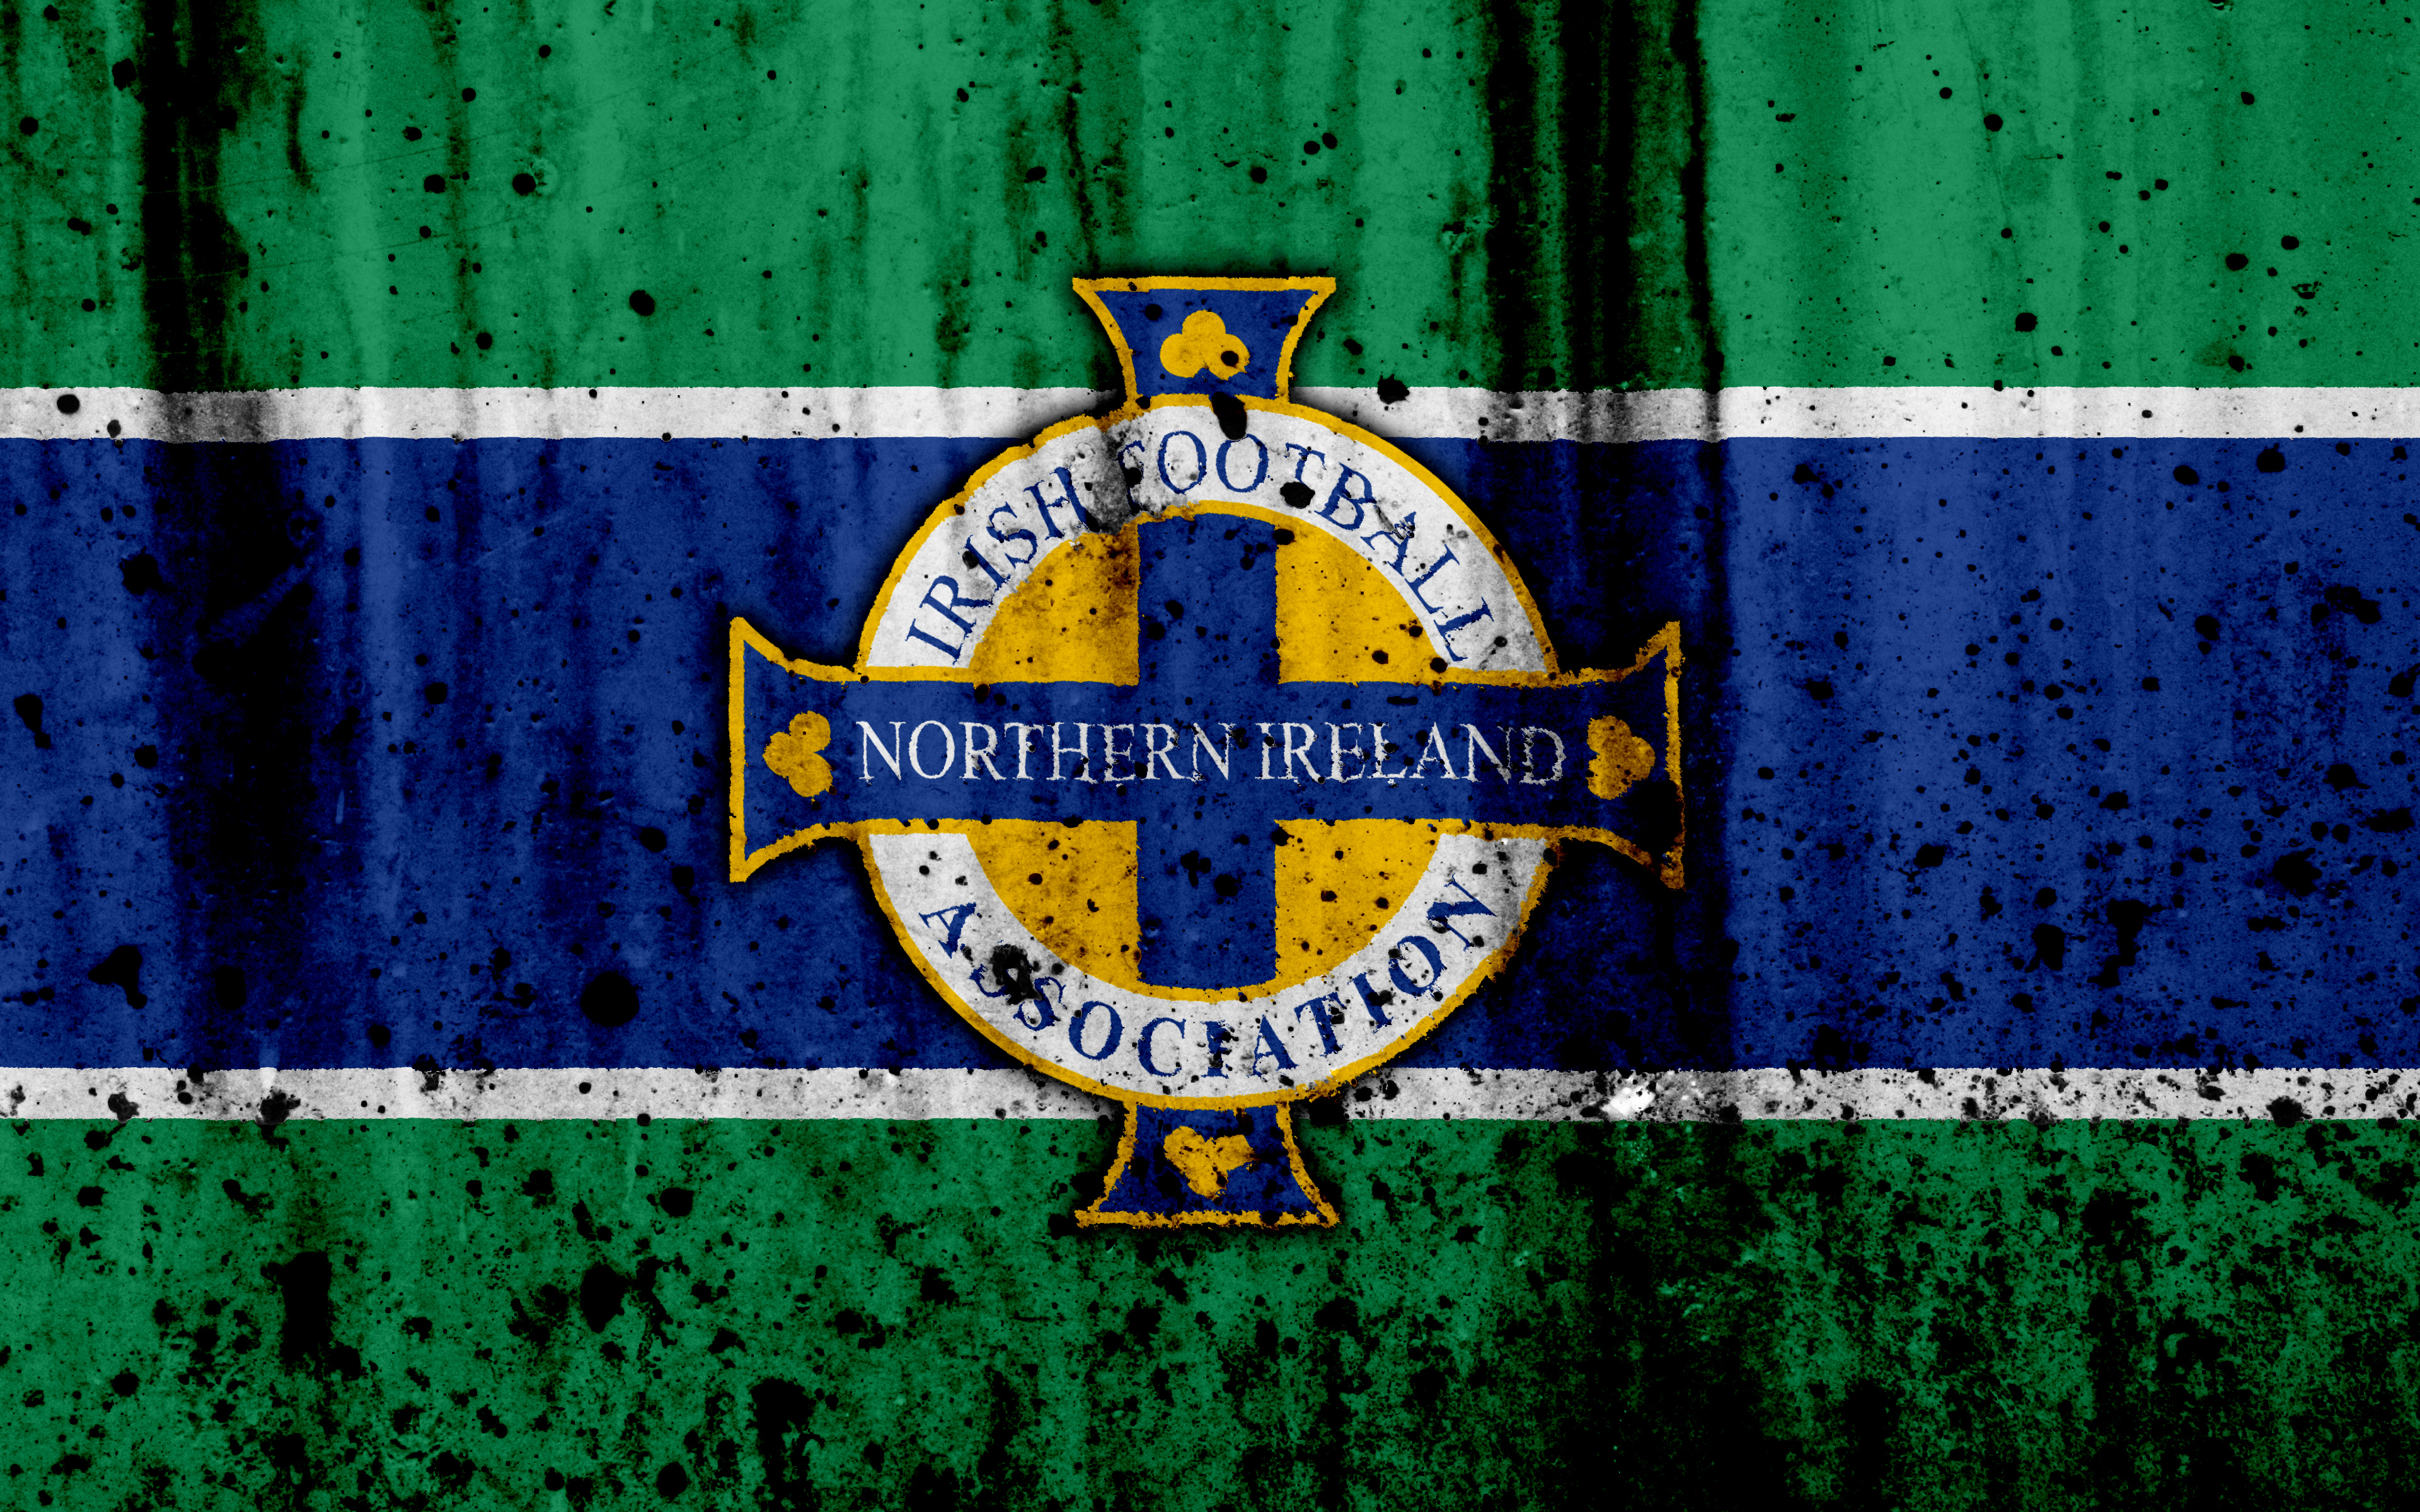 Northern Ireland National Football Team 4k Ultra HD Wallpaper 3840x2400